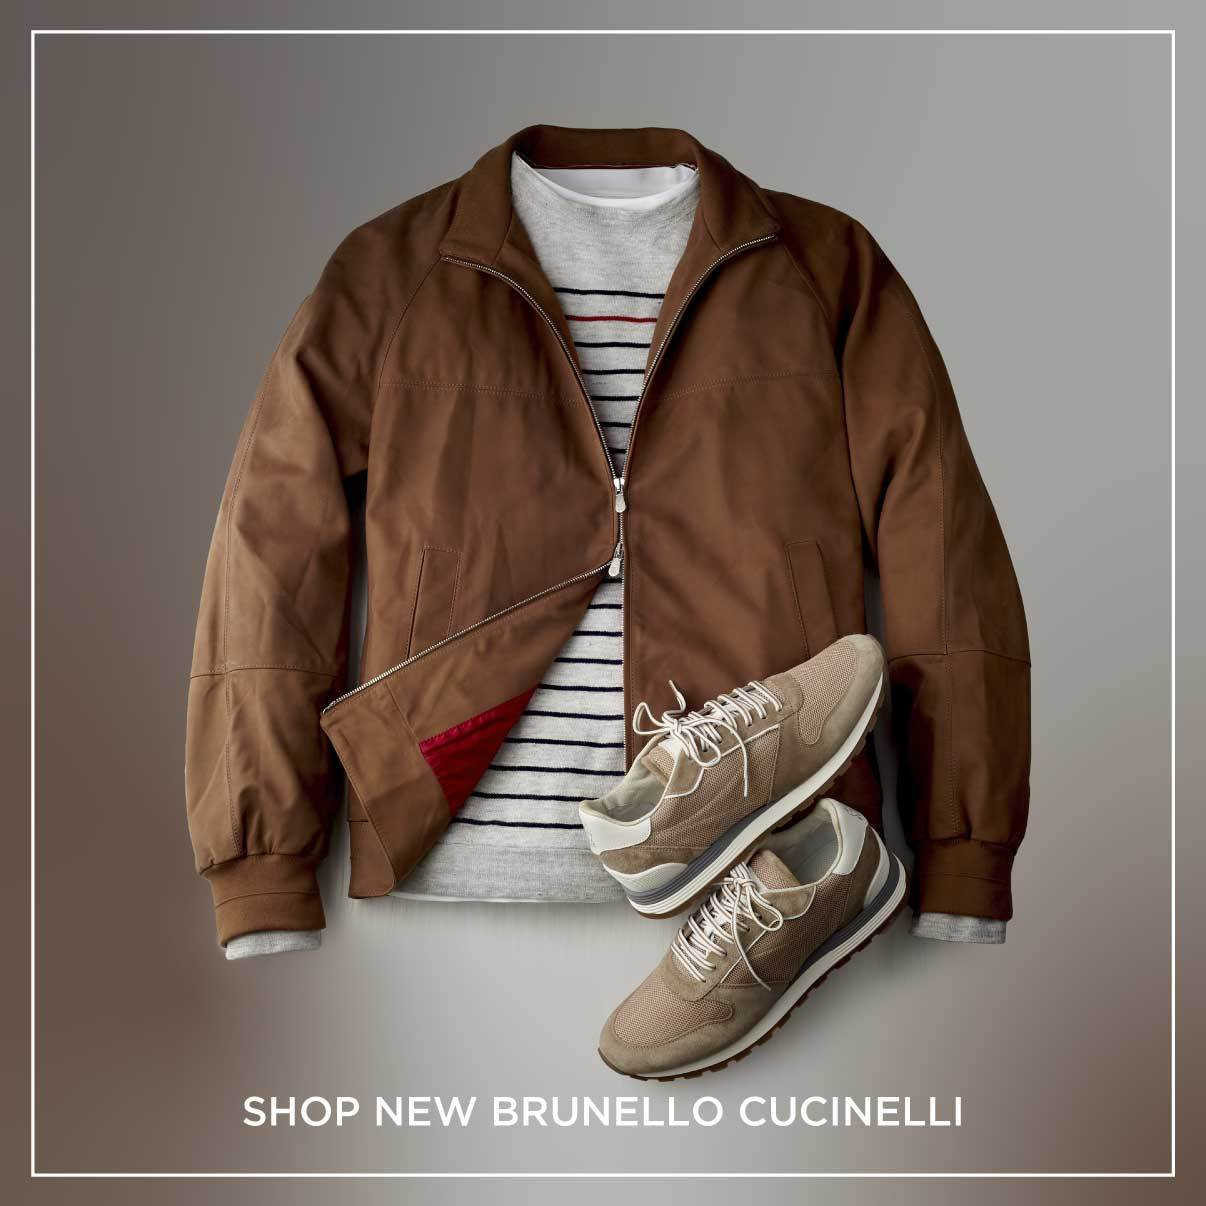 SHop New Brunello Cucinelli